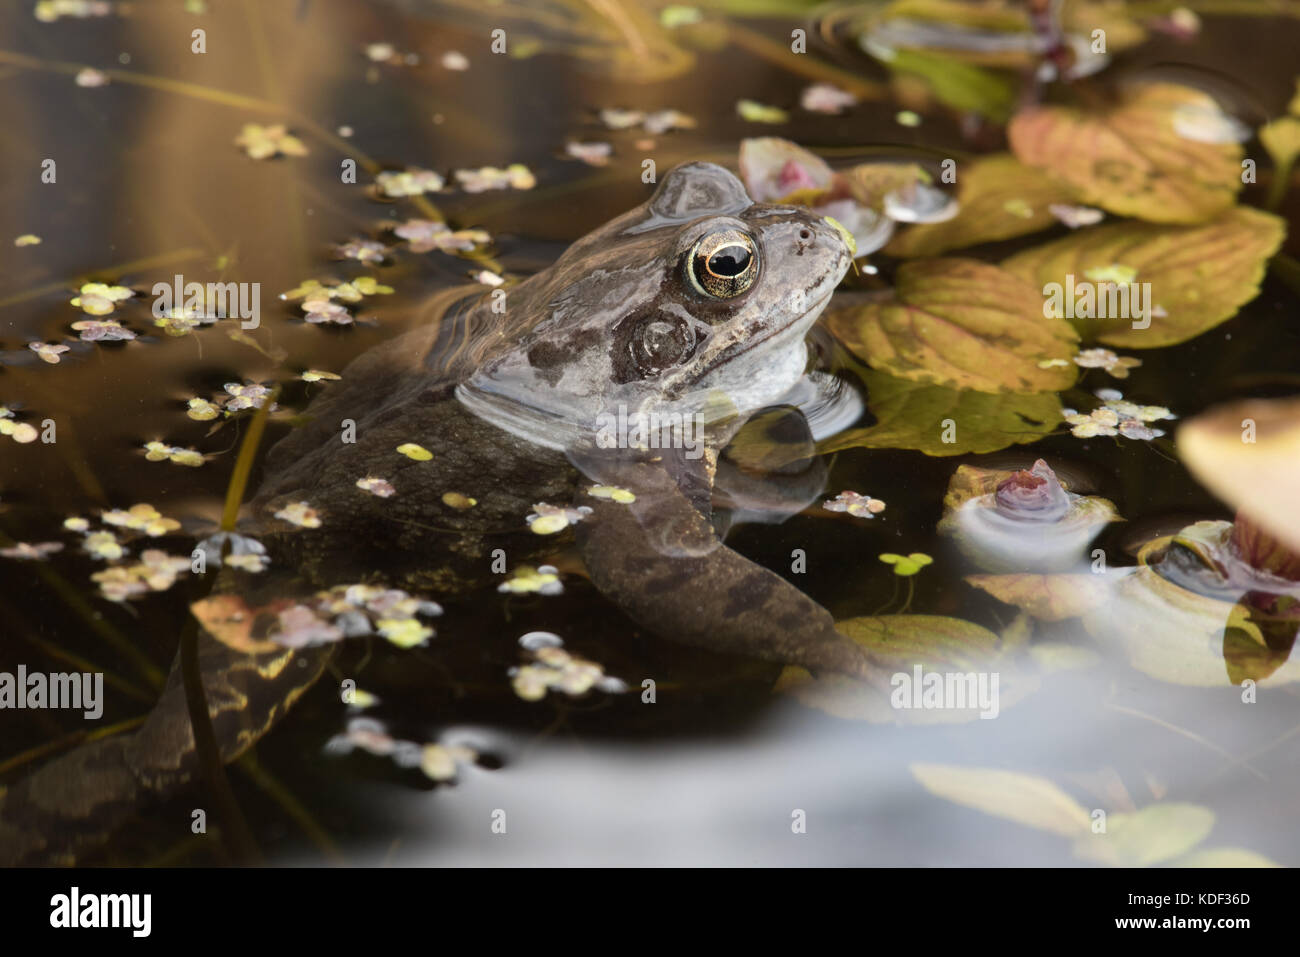 common frog in garden pond Stock Photo